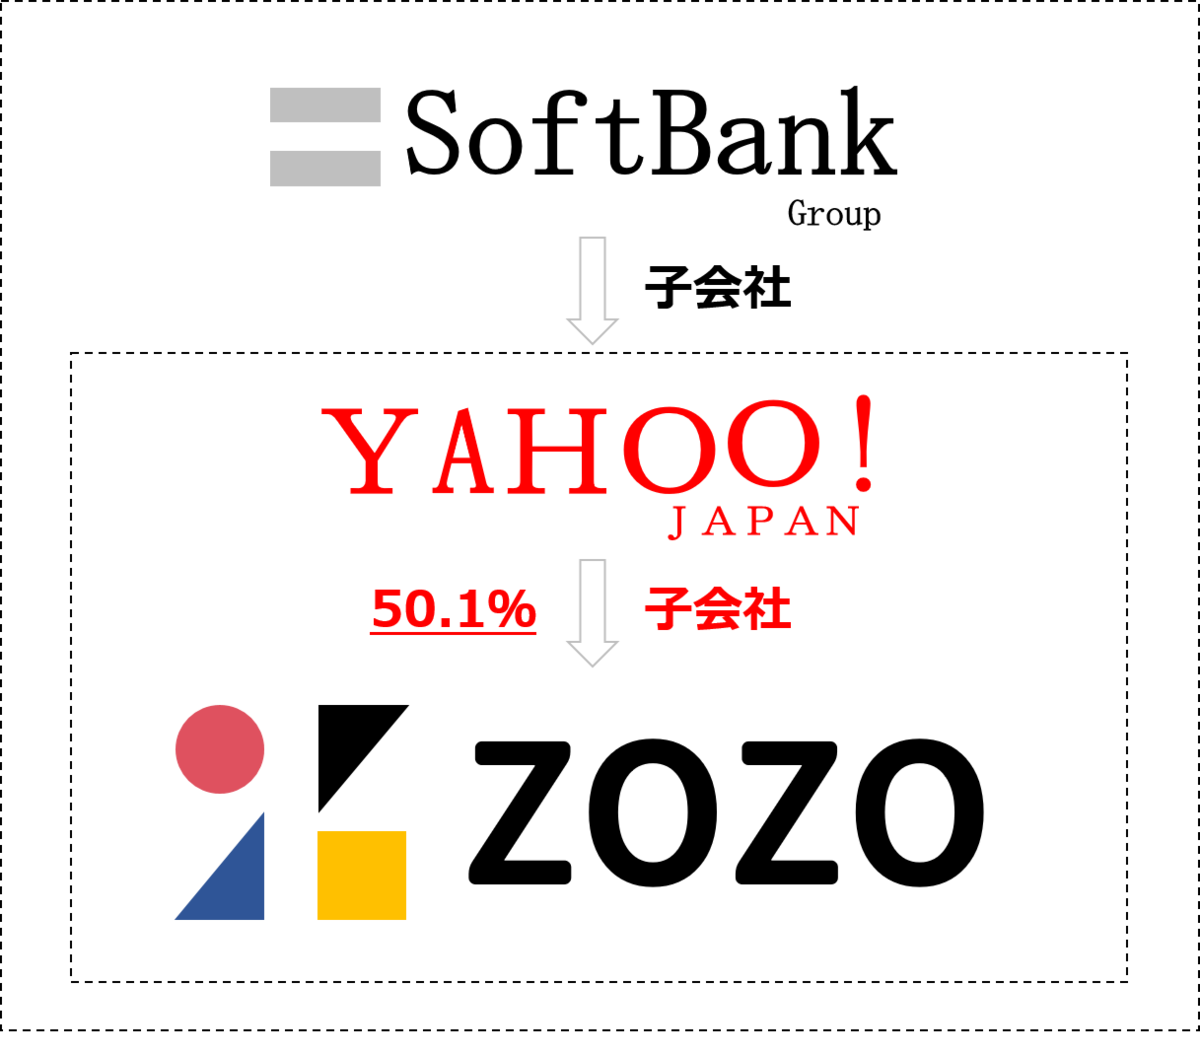 f:id:koala_log:20191107105637p:plain